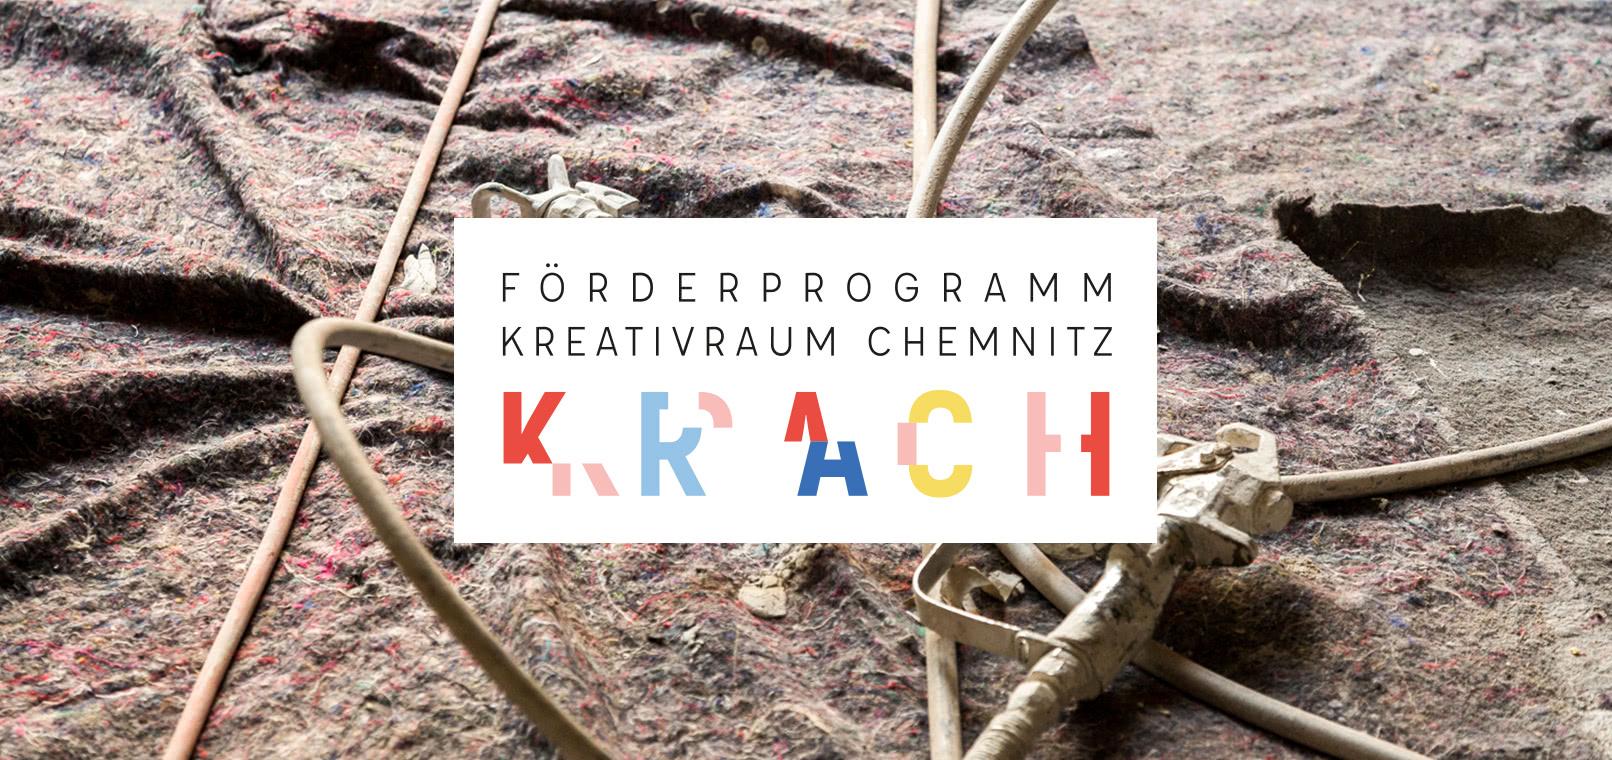 KRACH - Förderprogramm für den Kreativraum Chemnitz - Kreatives ...